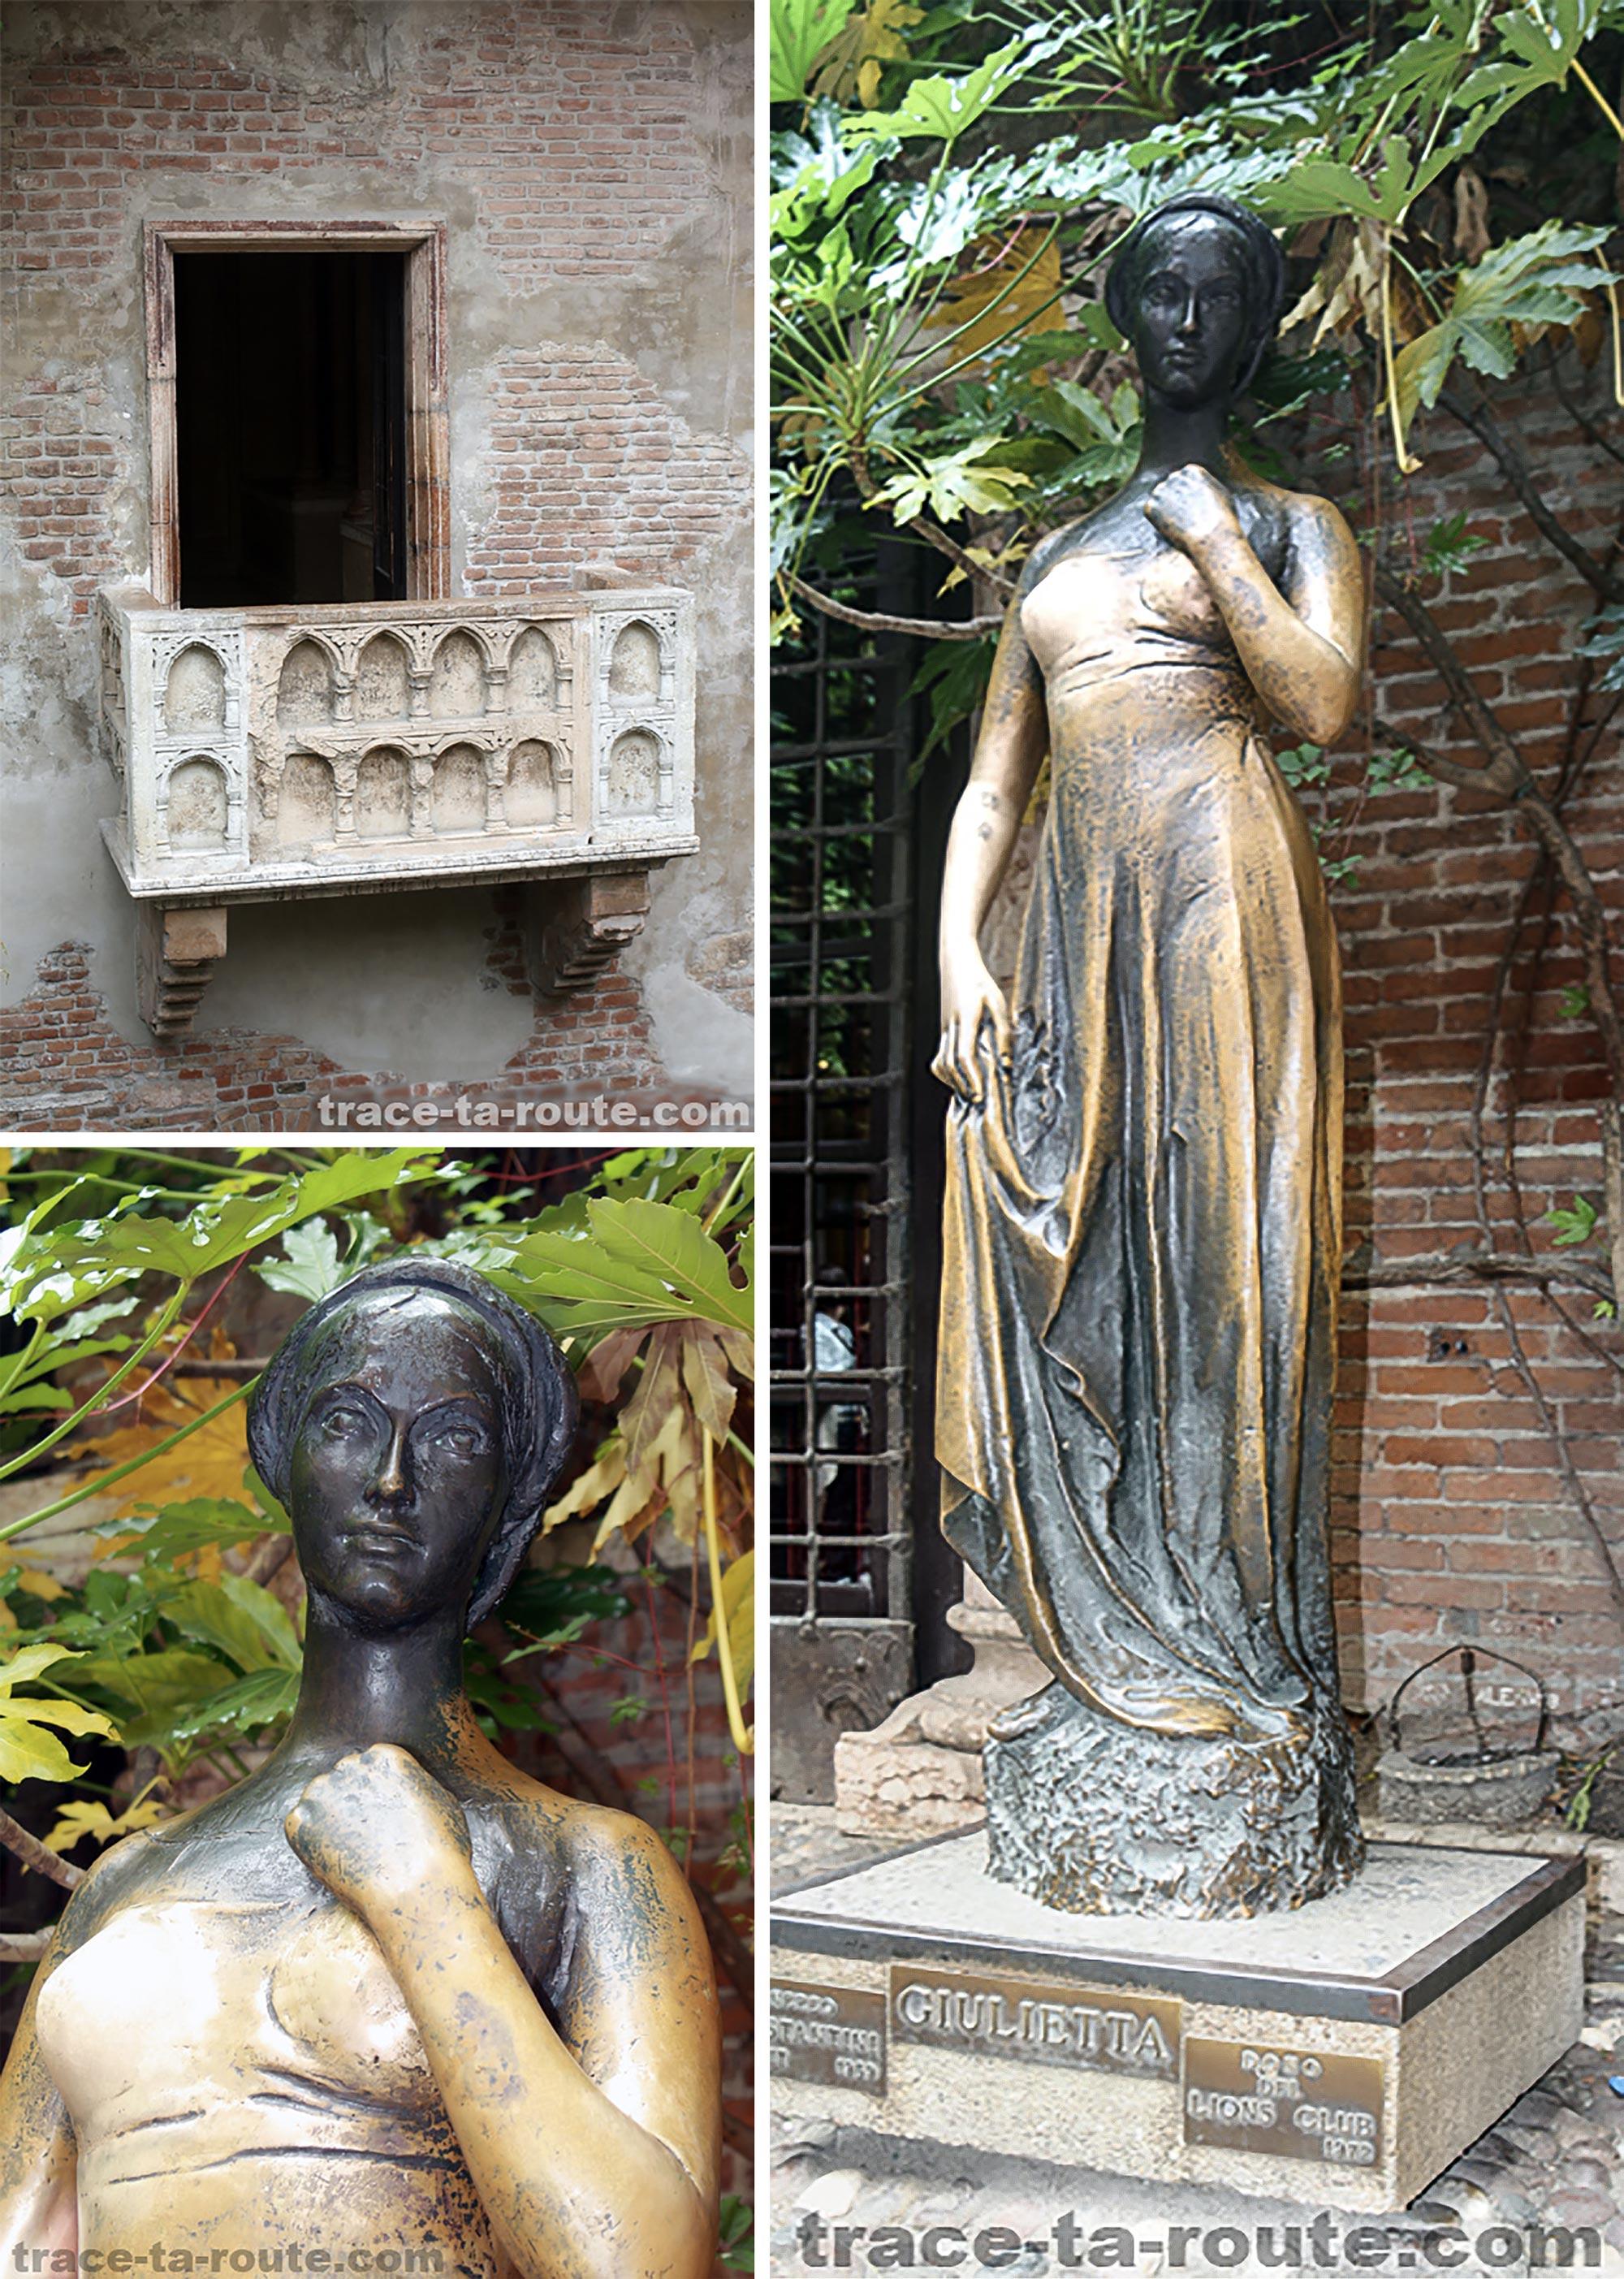 Maison de Juliette Vérone Tourisme Italie Voyage - Casa di Giuletta Verona Italia Visit Italy Travel - Statue Art Sculpture